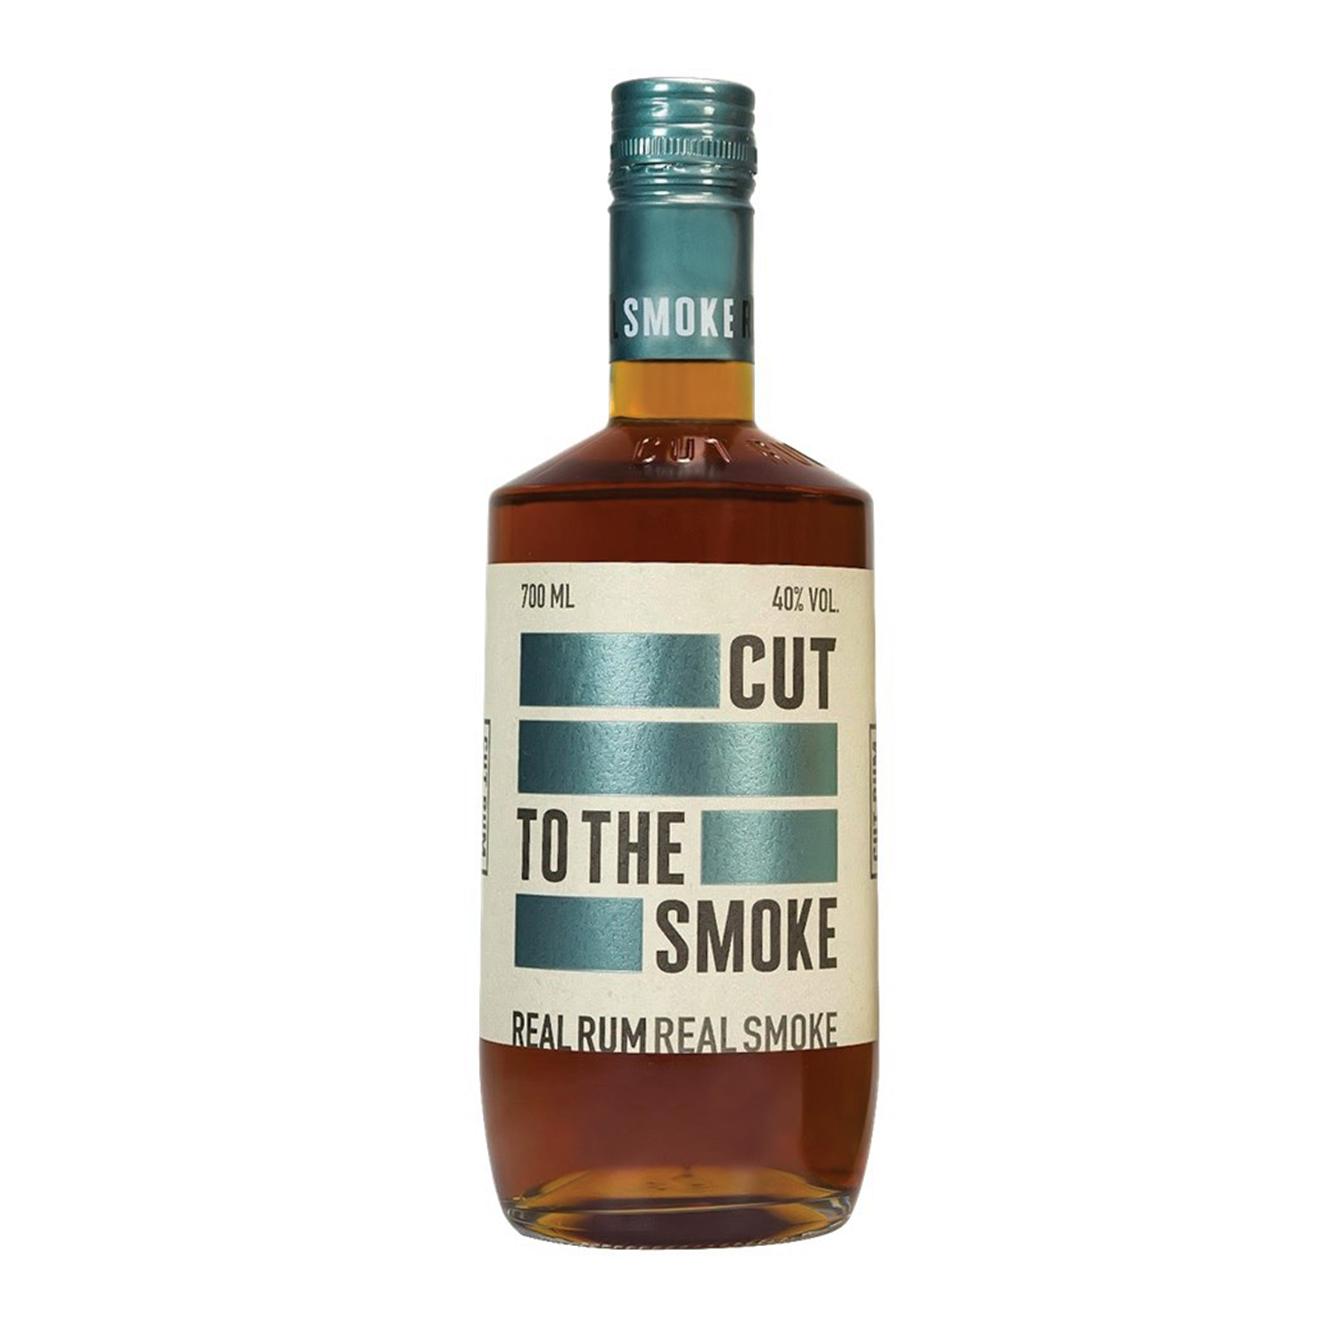 Cut To The Smoke Rum